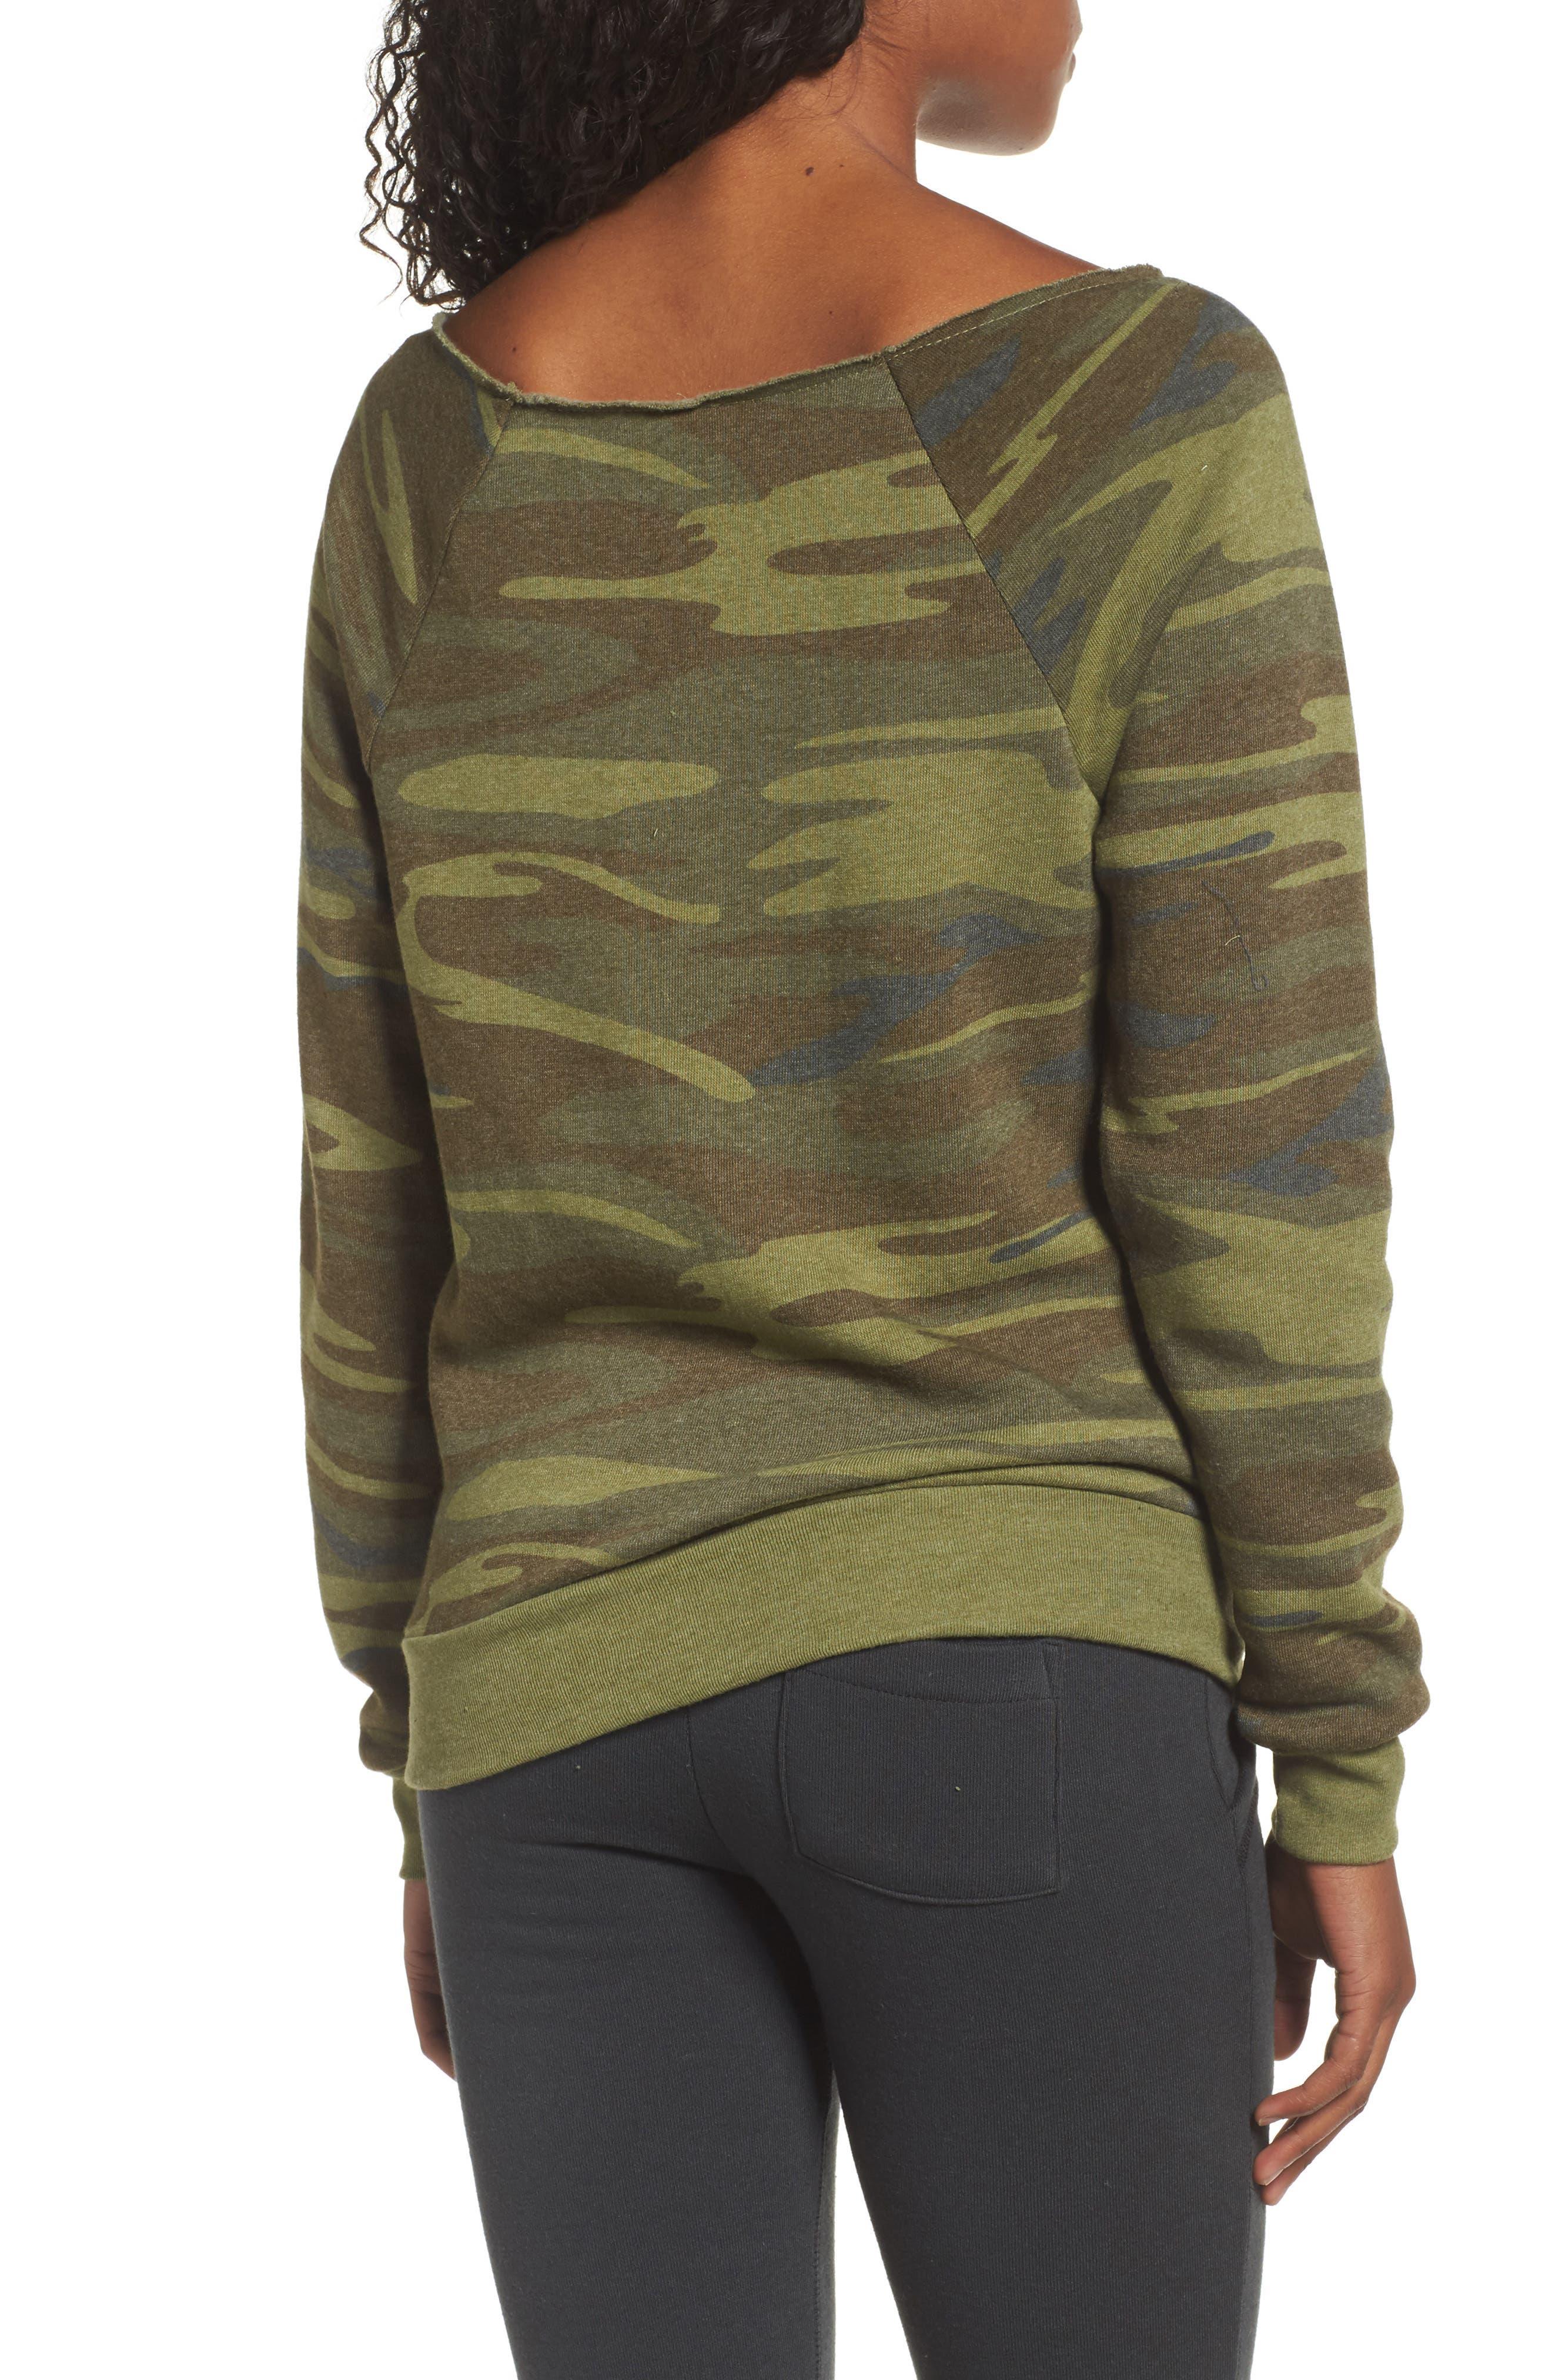 Alternate Image 2  - Alternative Maniac Camo Fleece Sweatshirt